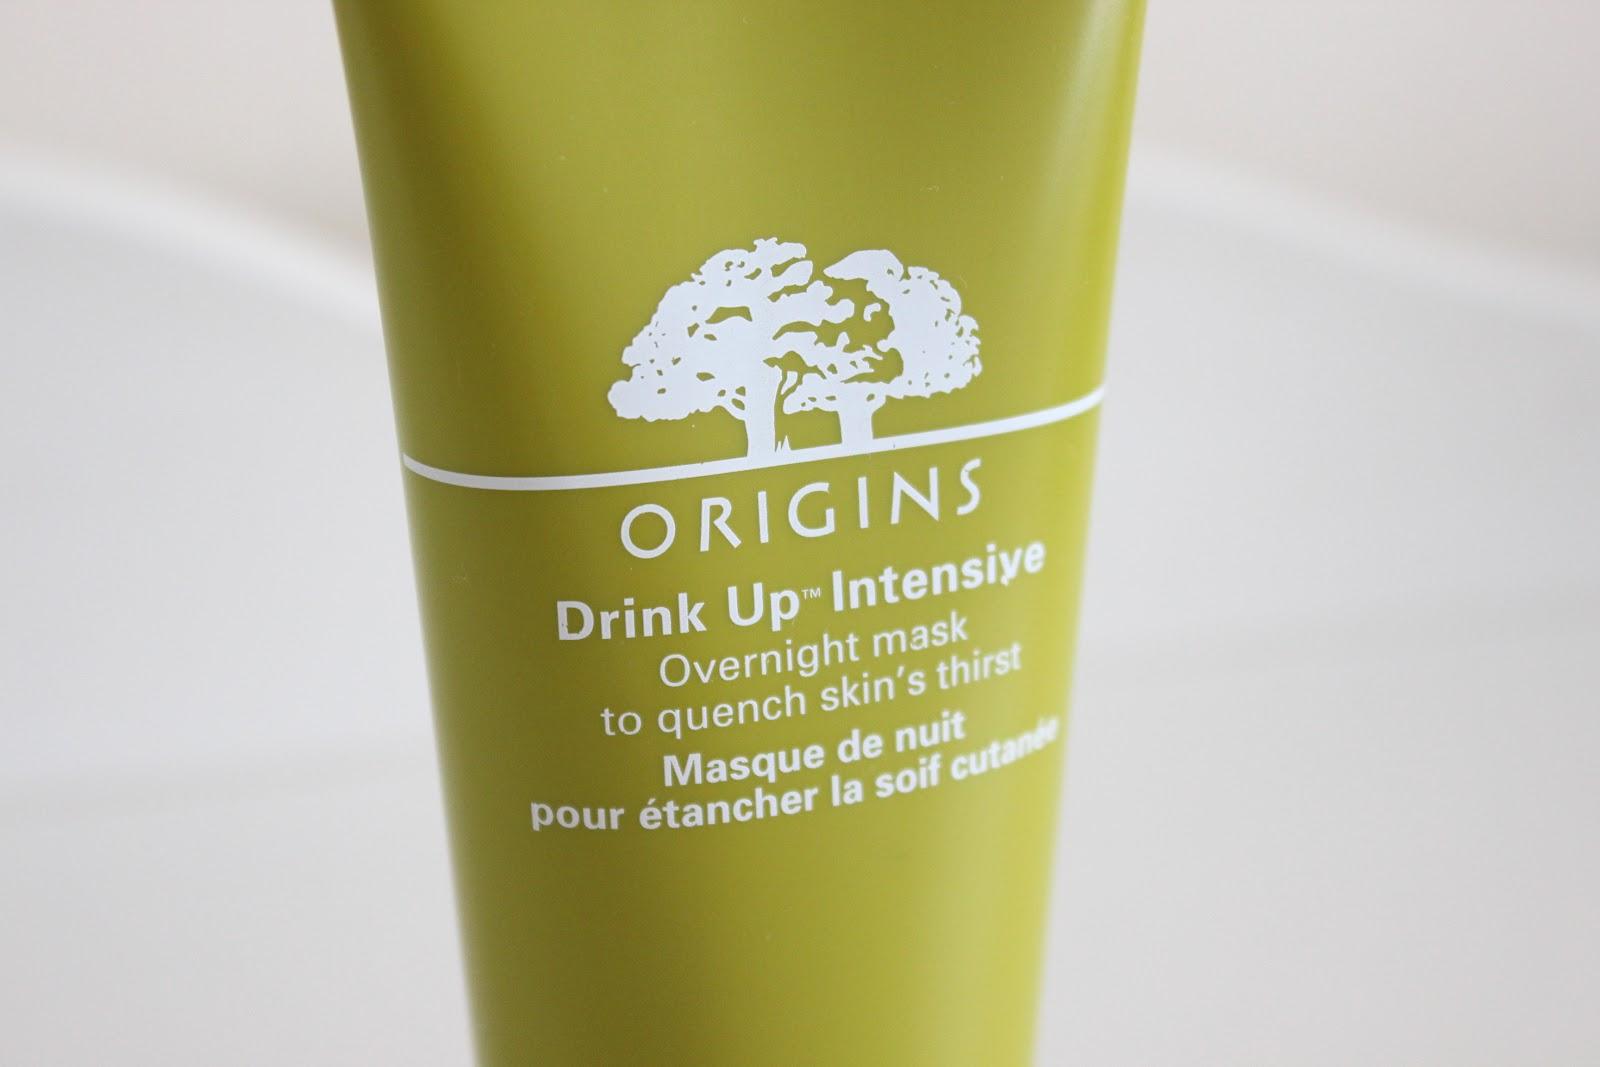 origins drink up intensive overnight mask instructions